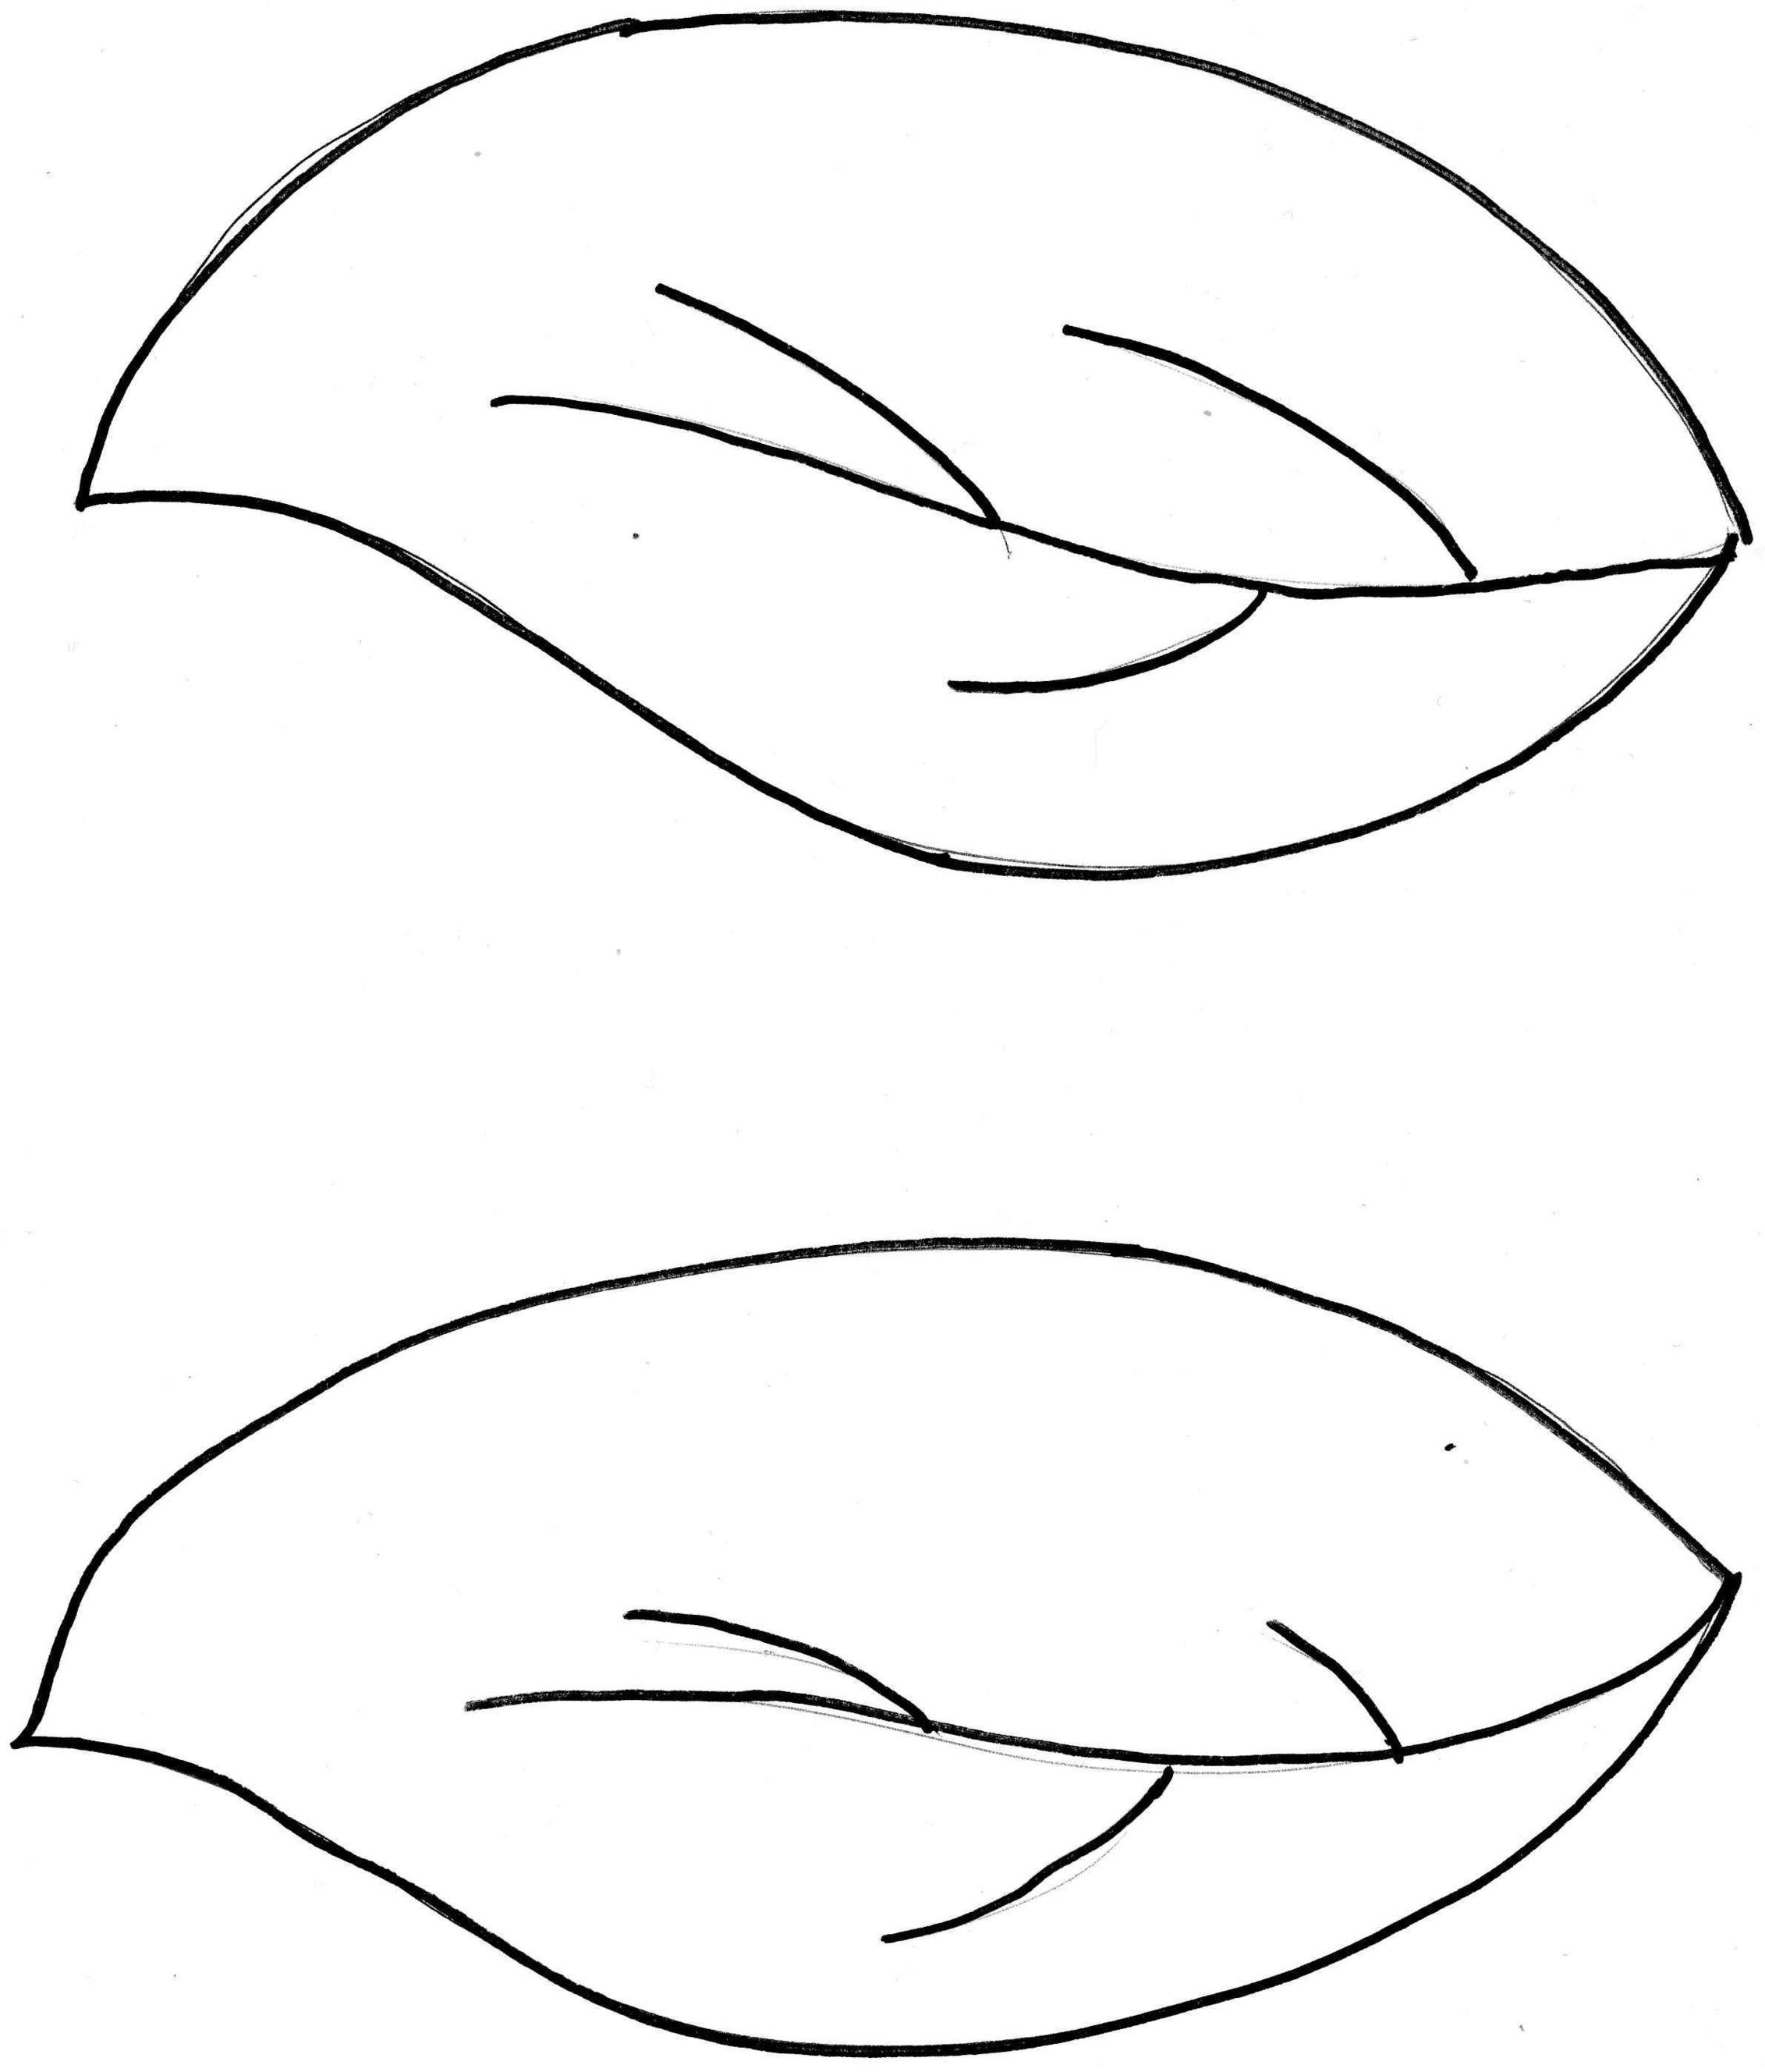 Leaves clipart leaf outline #4